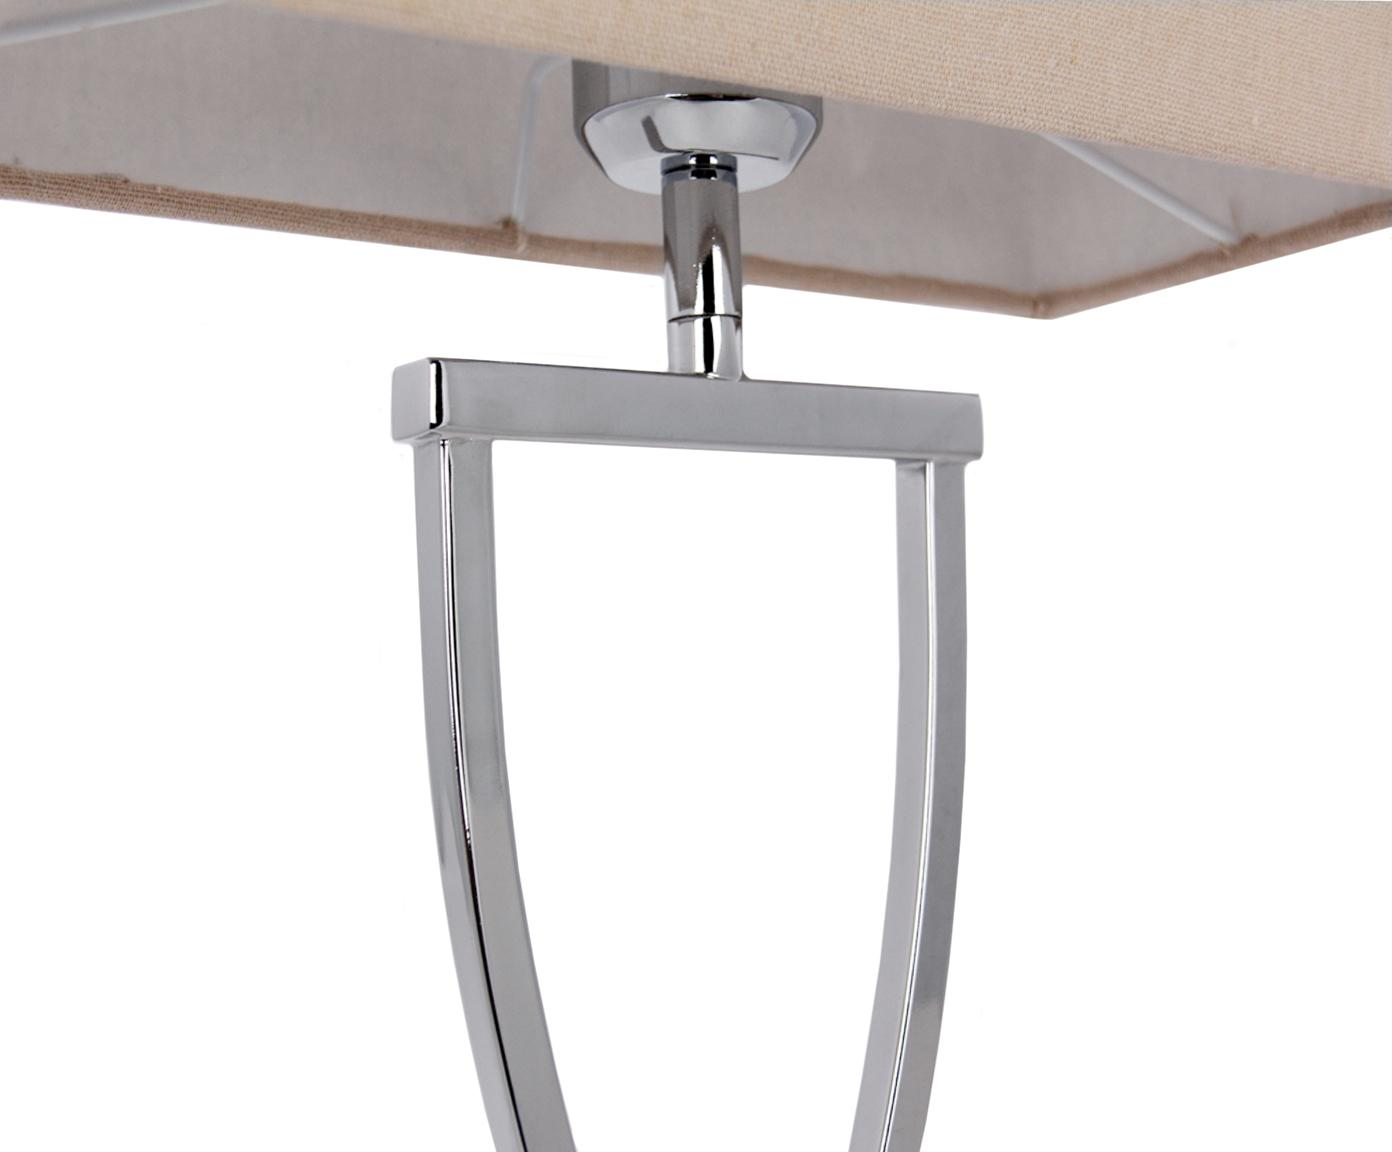 Tafellamp Vanessa, Lampvoet: metaal, Lampenkap: textiel, Lampvoet: chroomkleurig. Lampenkap: taupe. Snoer: wit, 27 x 52 cm